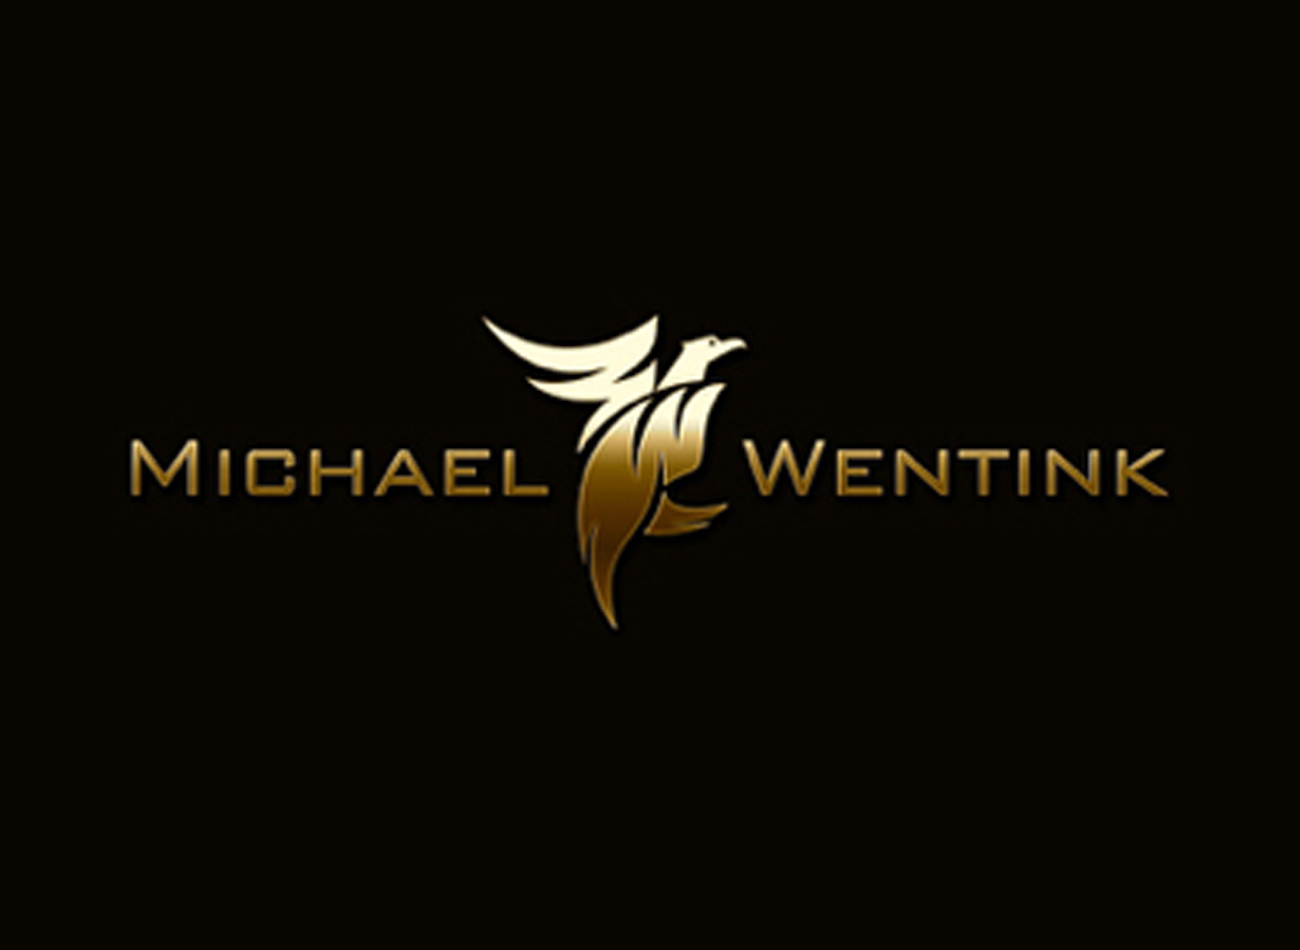 illustrative-logo-design-michael-wentink-by-agent-orange-design-johannesburg.jpg